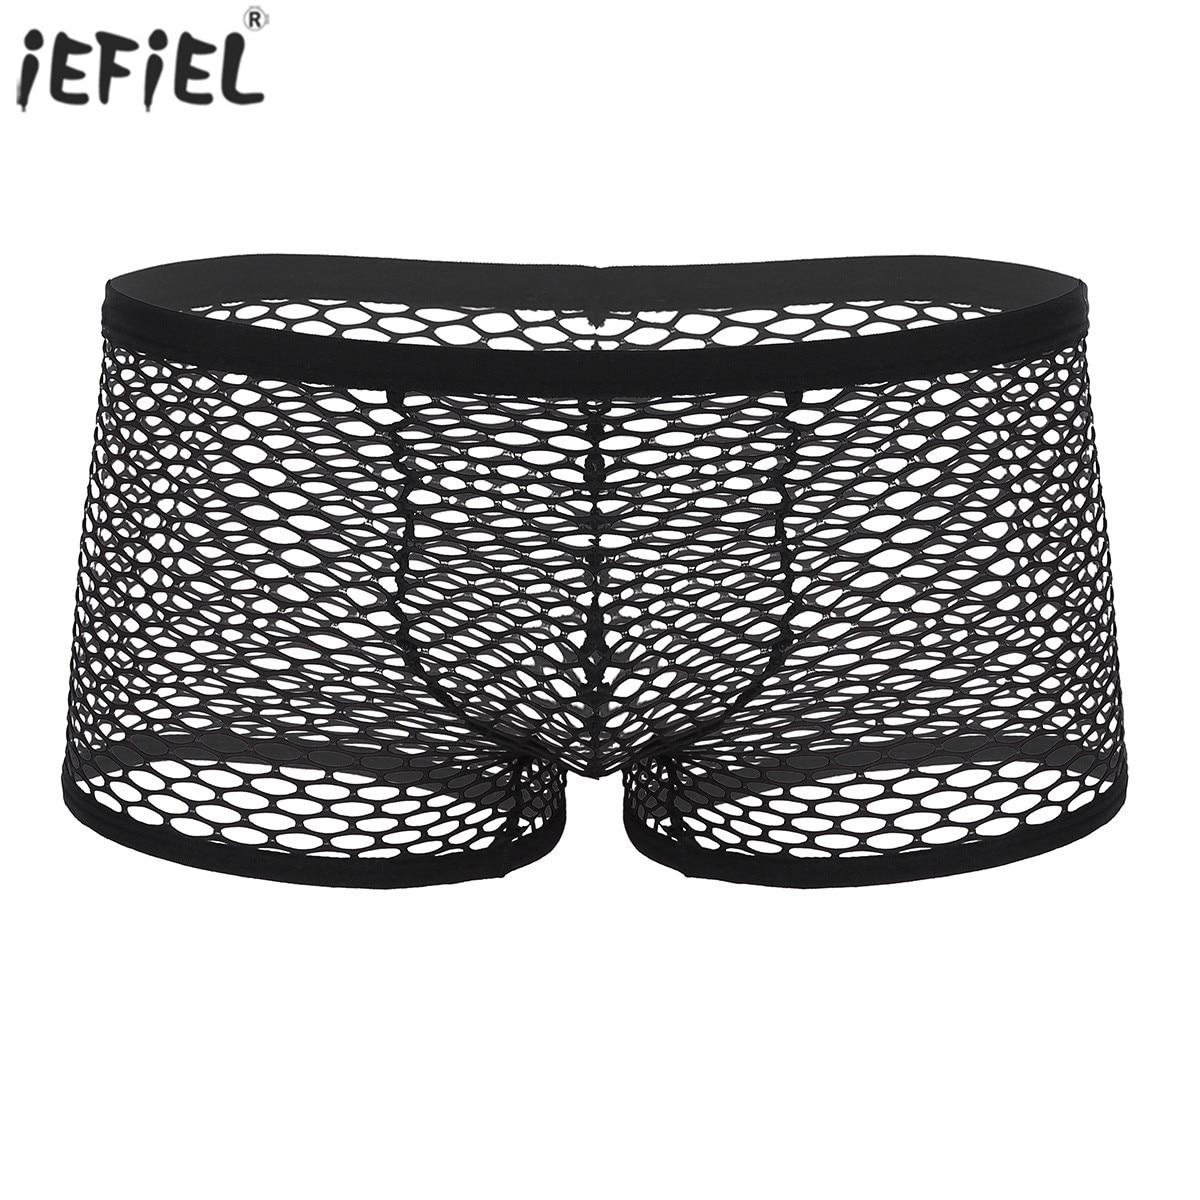 Boxer boxer shorts respirável ver através de pura fishnet sexy cueca gay baixo aumento transparente malha boxer shorts roupa interior exótica